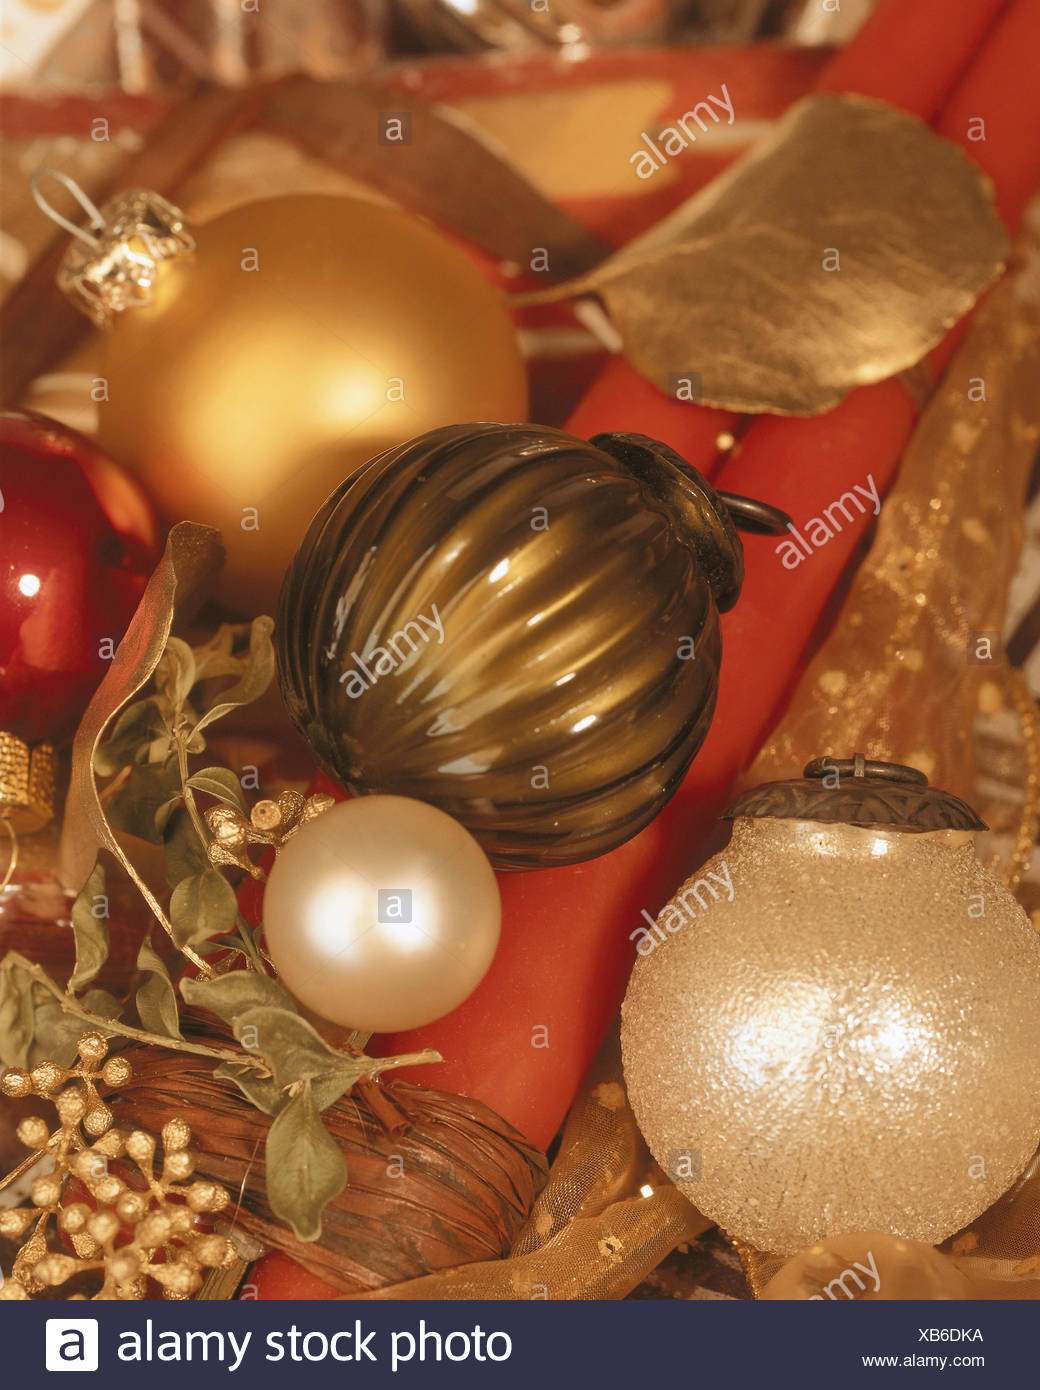 Weihnachtsdeko Xmas.Christmas Decoration Tree Detail Golden Stock Photos Christmas